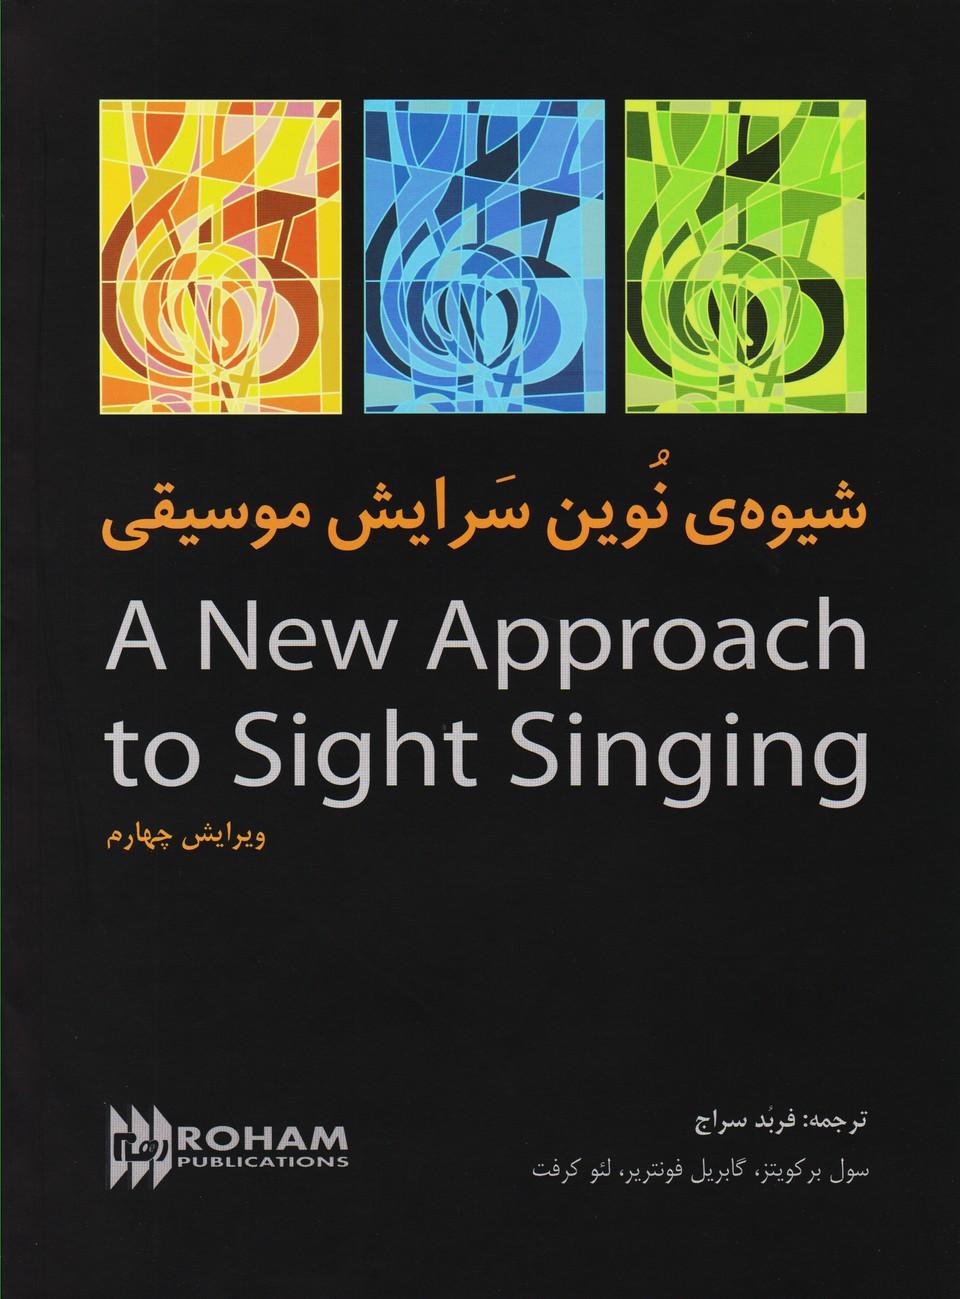 شیوه نوین سرایش موسیقی  A New Approach to Sight Singing